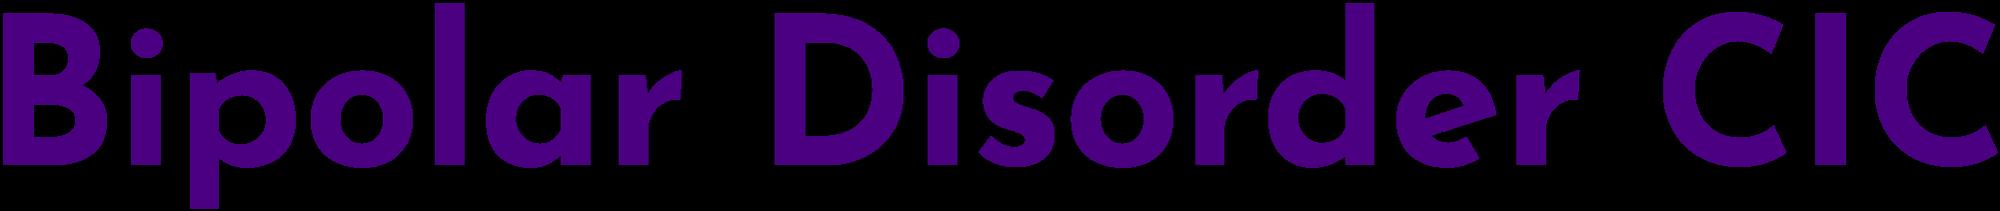 Bipolar Disorder CIC